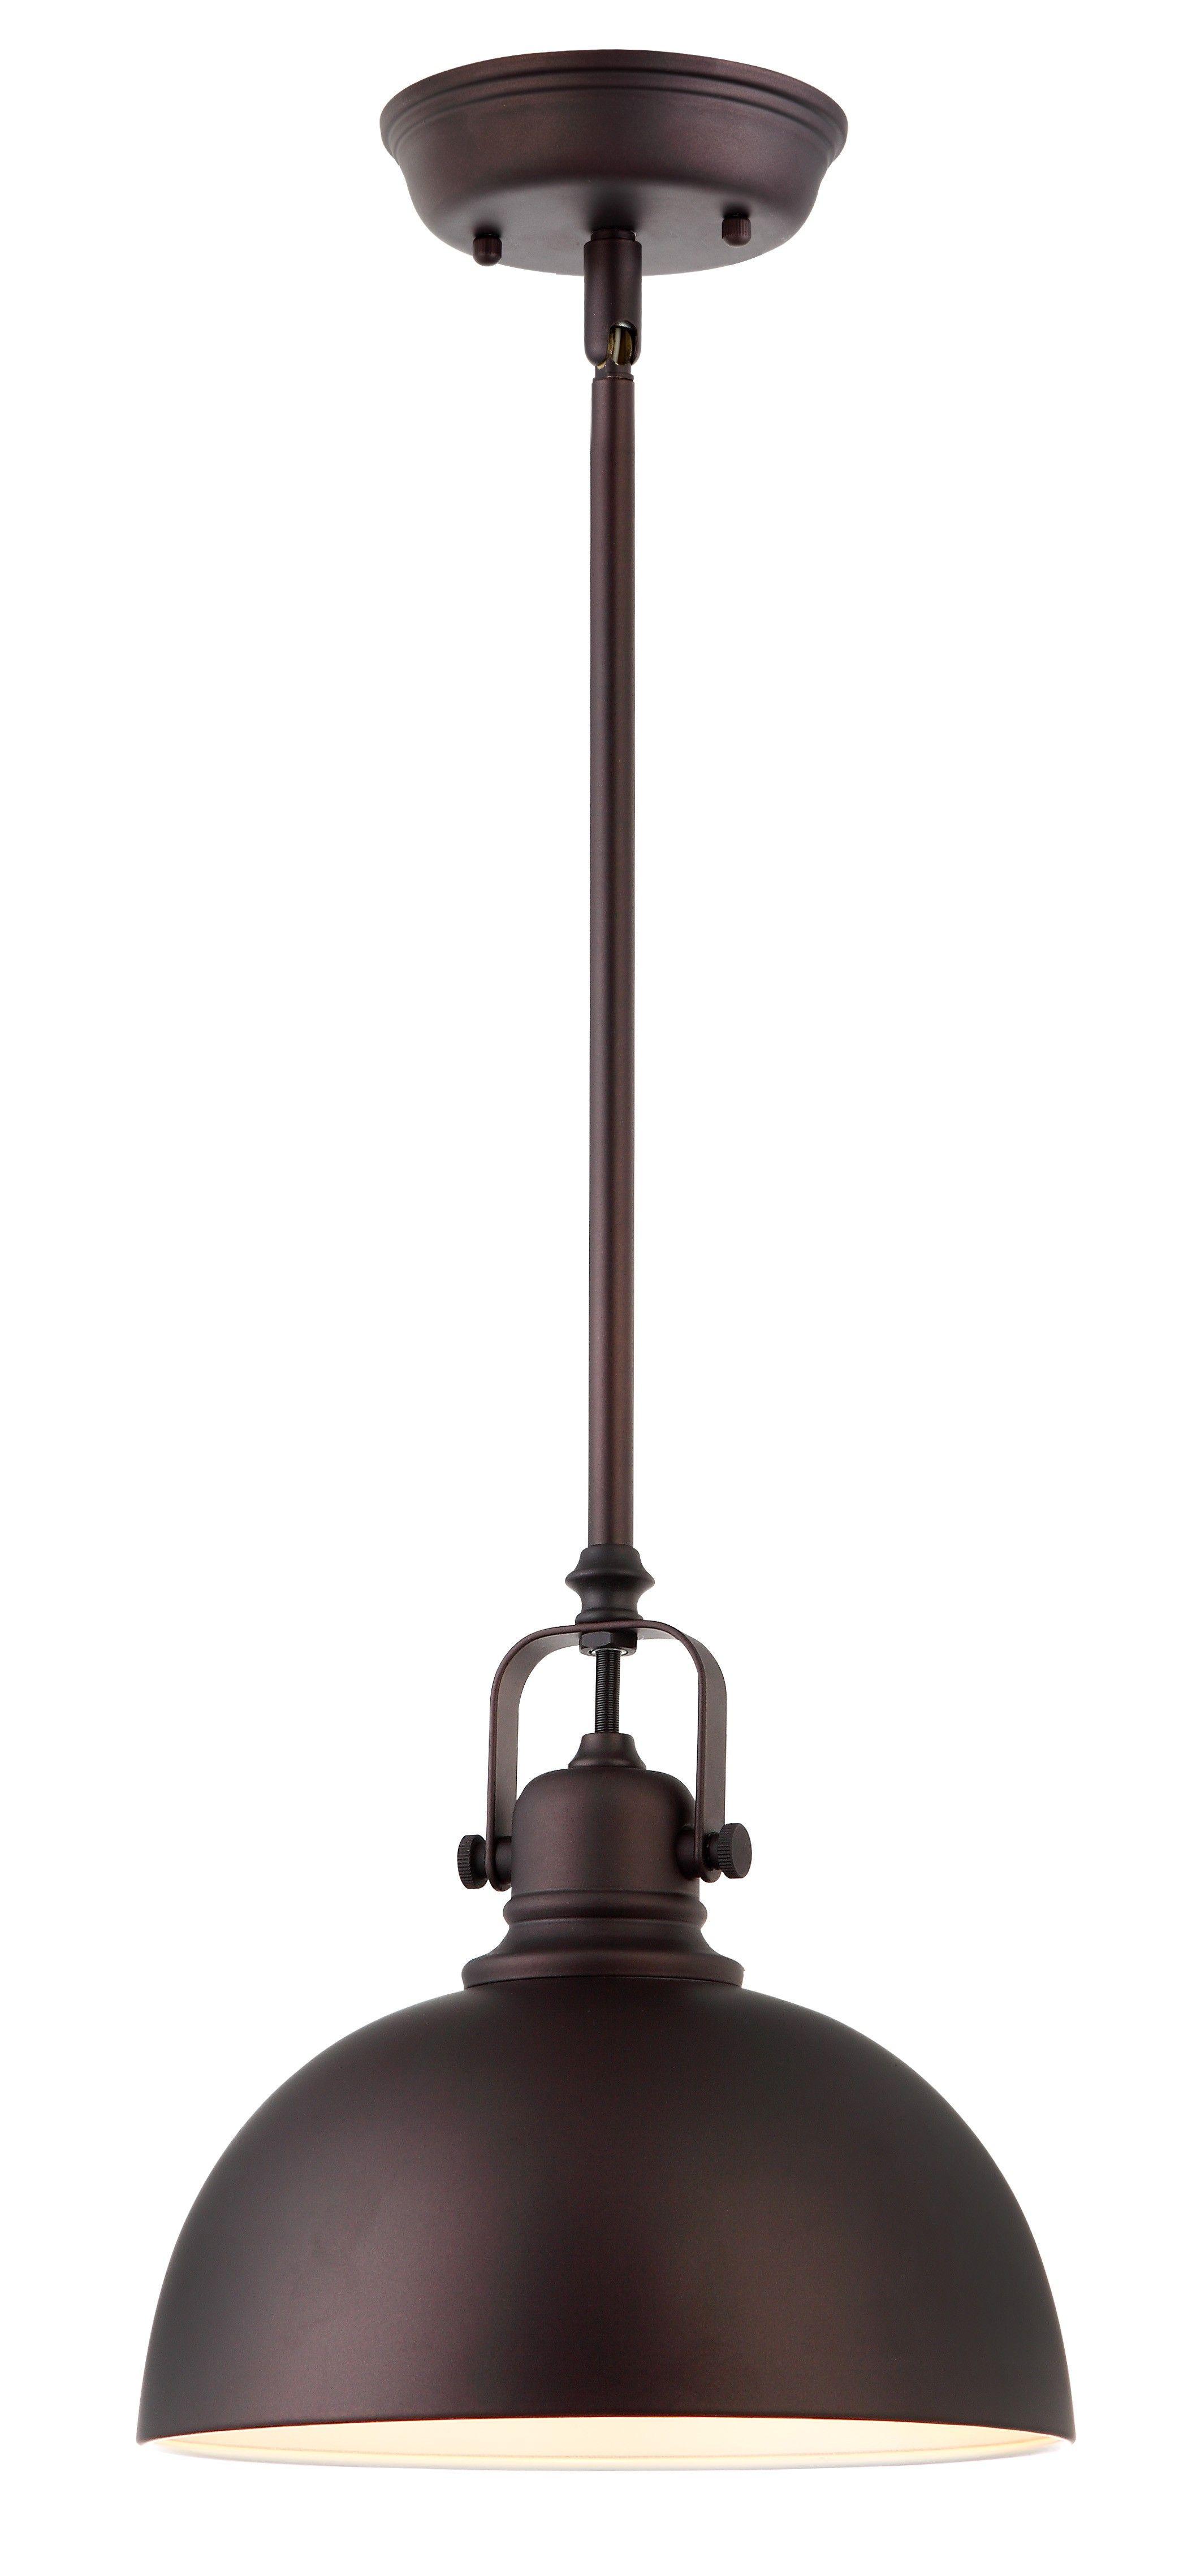 Bennington 2 Pack Of Ipl222b01 Orb Gd Hudson 1 Light Mini Pendants With Oil Rubbed Bronze Metal Shades Bronze Kitchen Bronze Pendant Light Oil Rubbed Bronze Kitchen